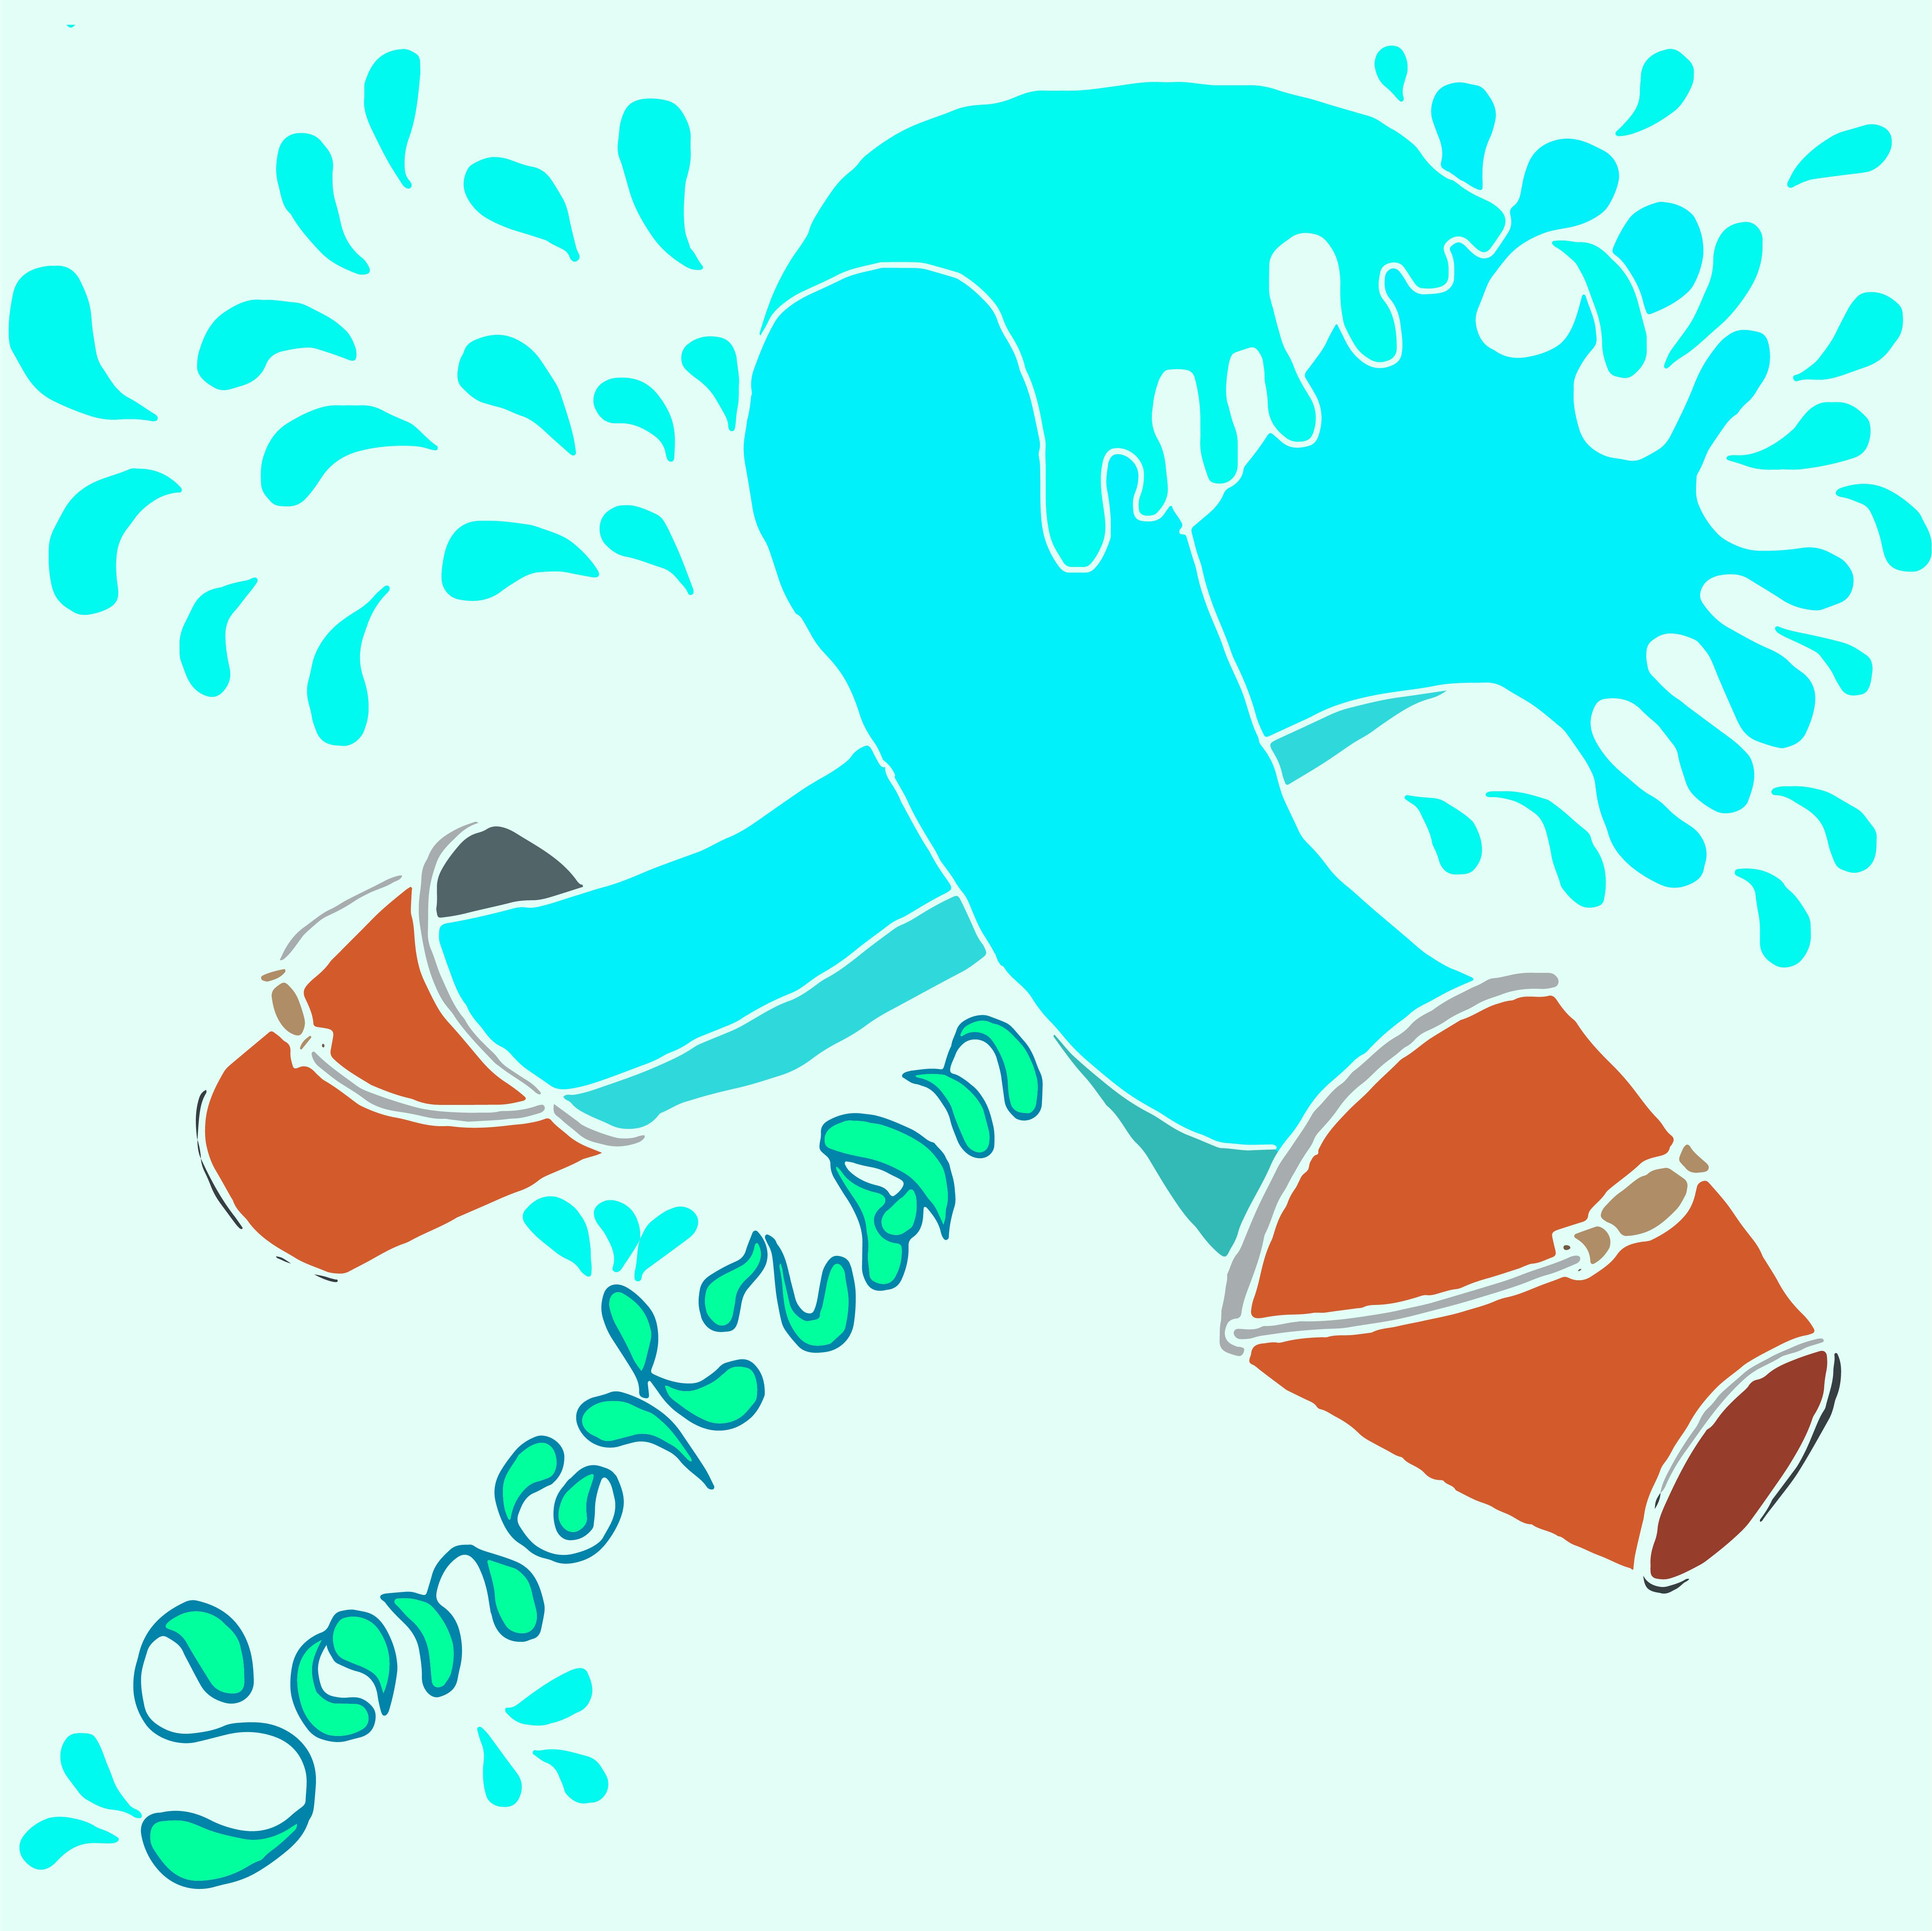 Songkran Festival example image 1